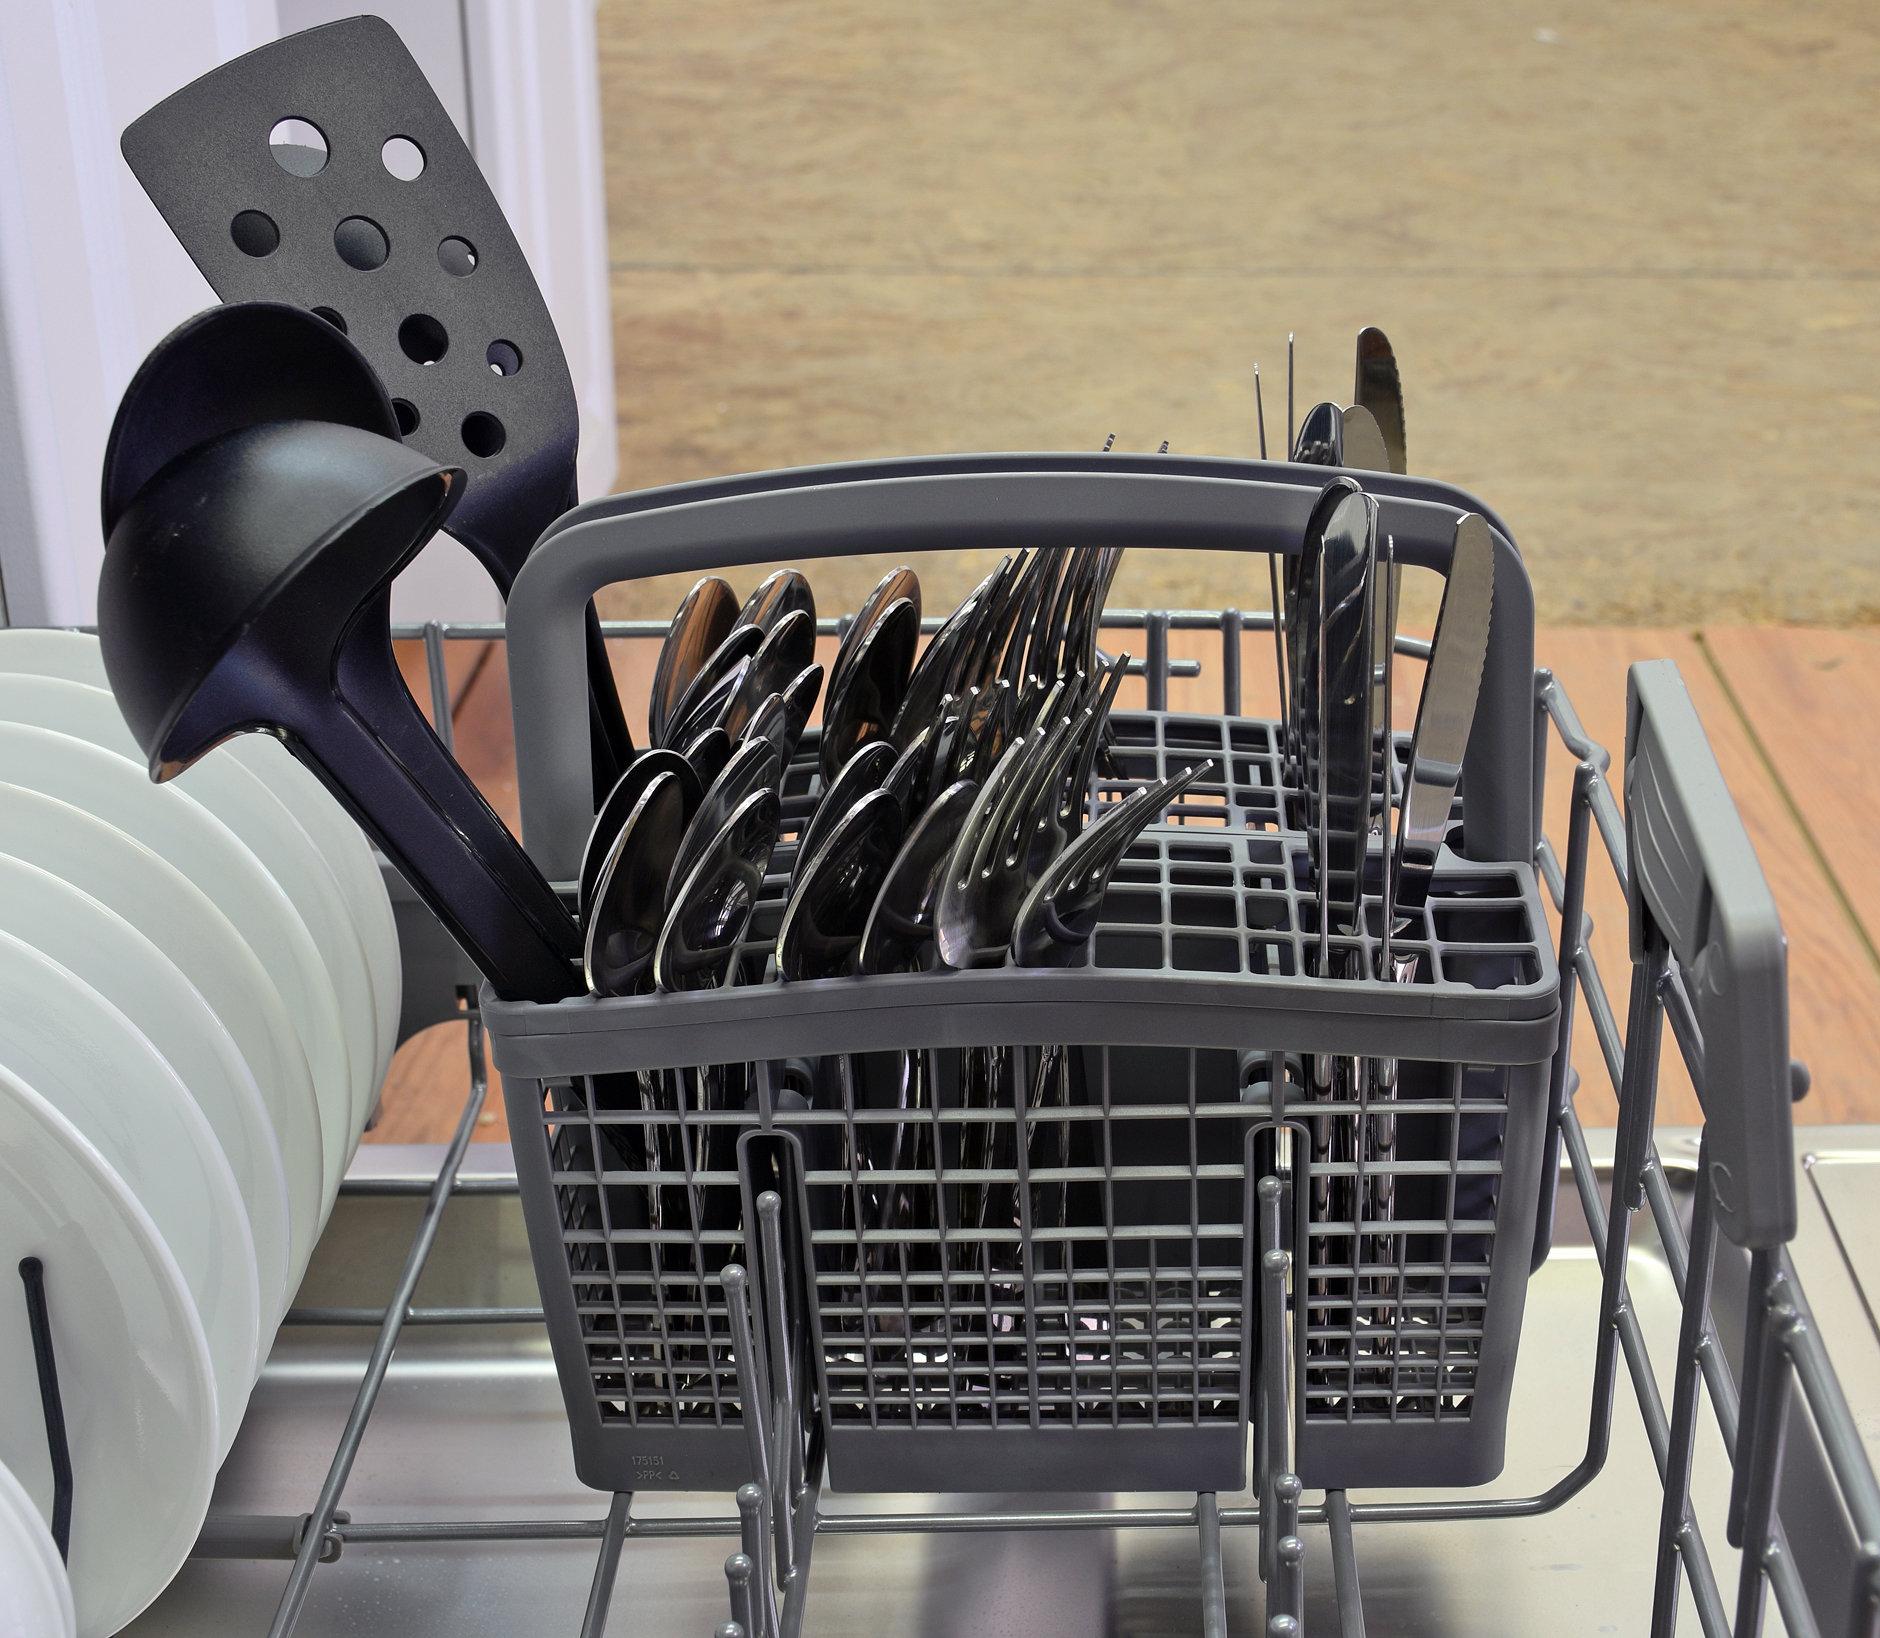 Blomberg DWT57500SS silverware basket capacity